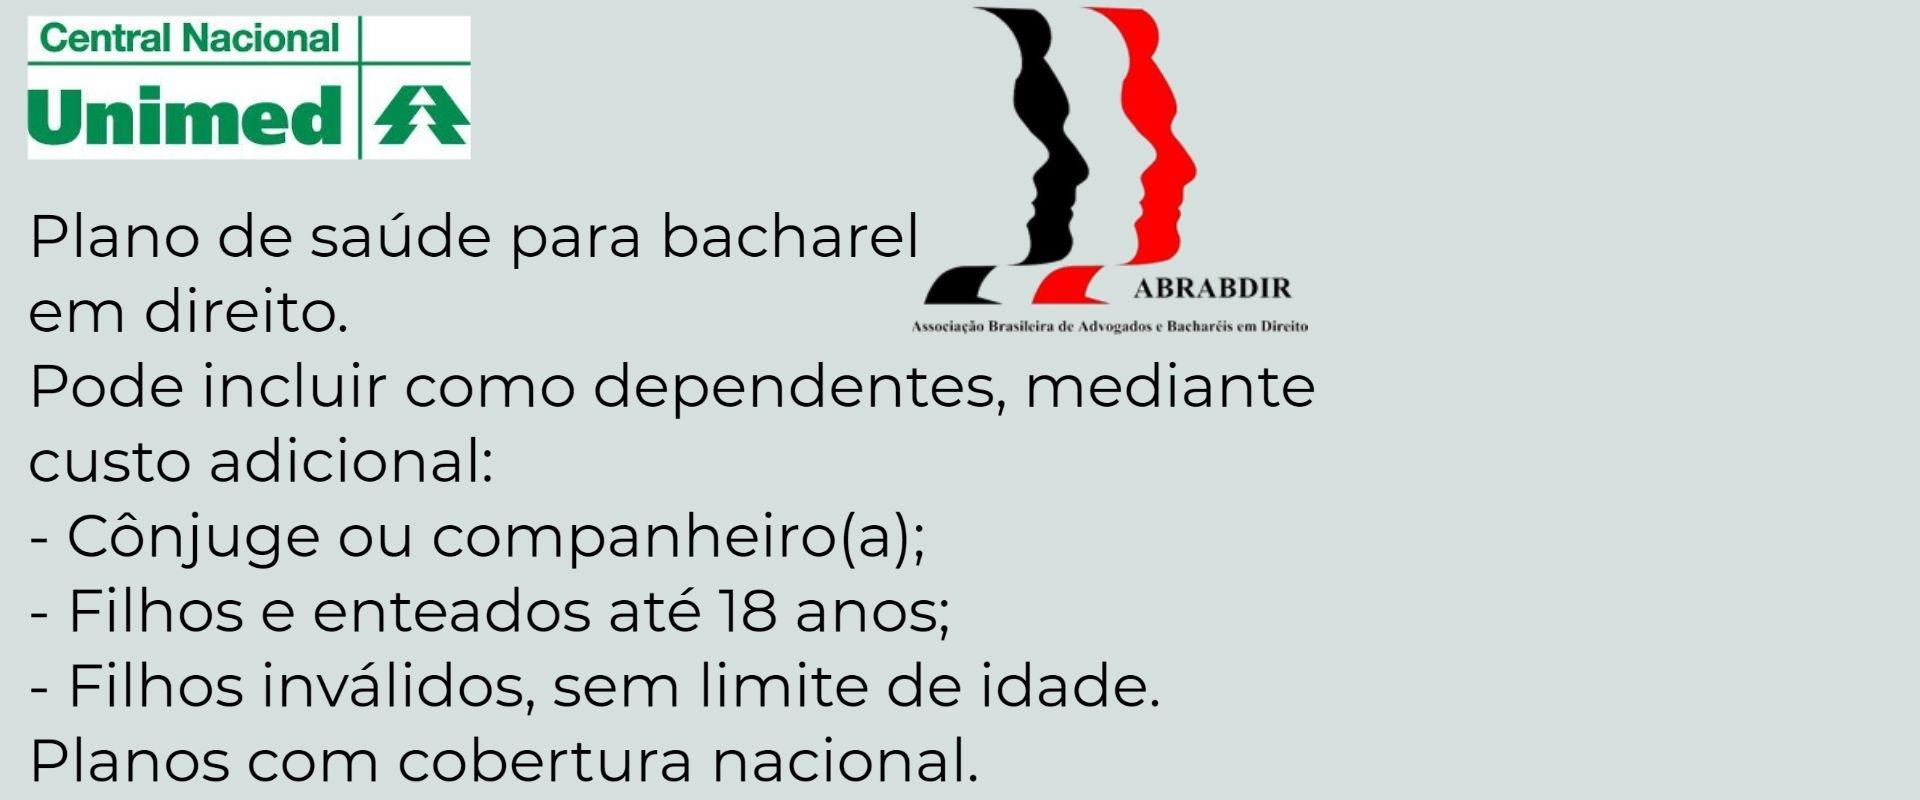 Unimed ABRABDIR Santana de Parnaíba